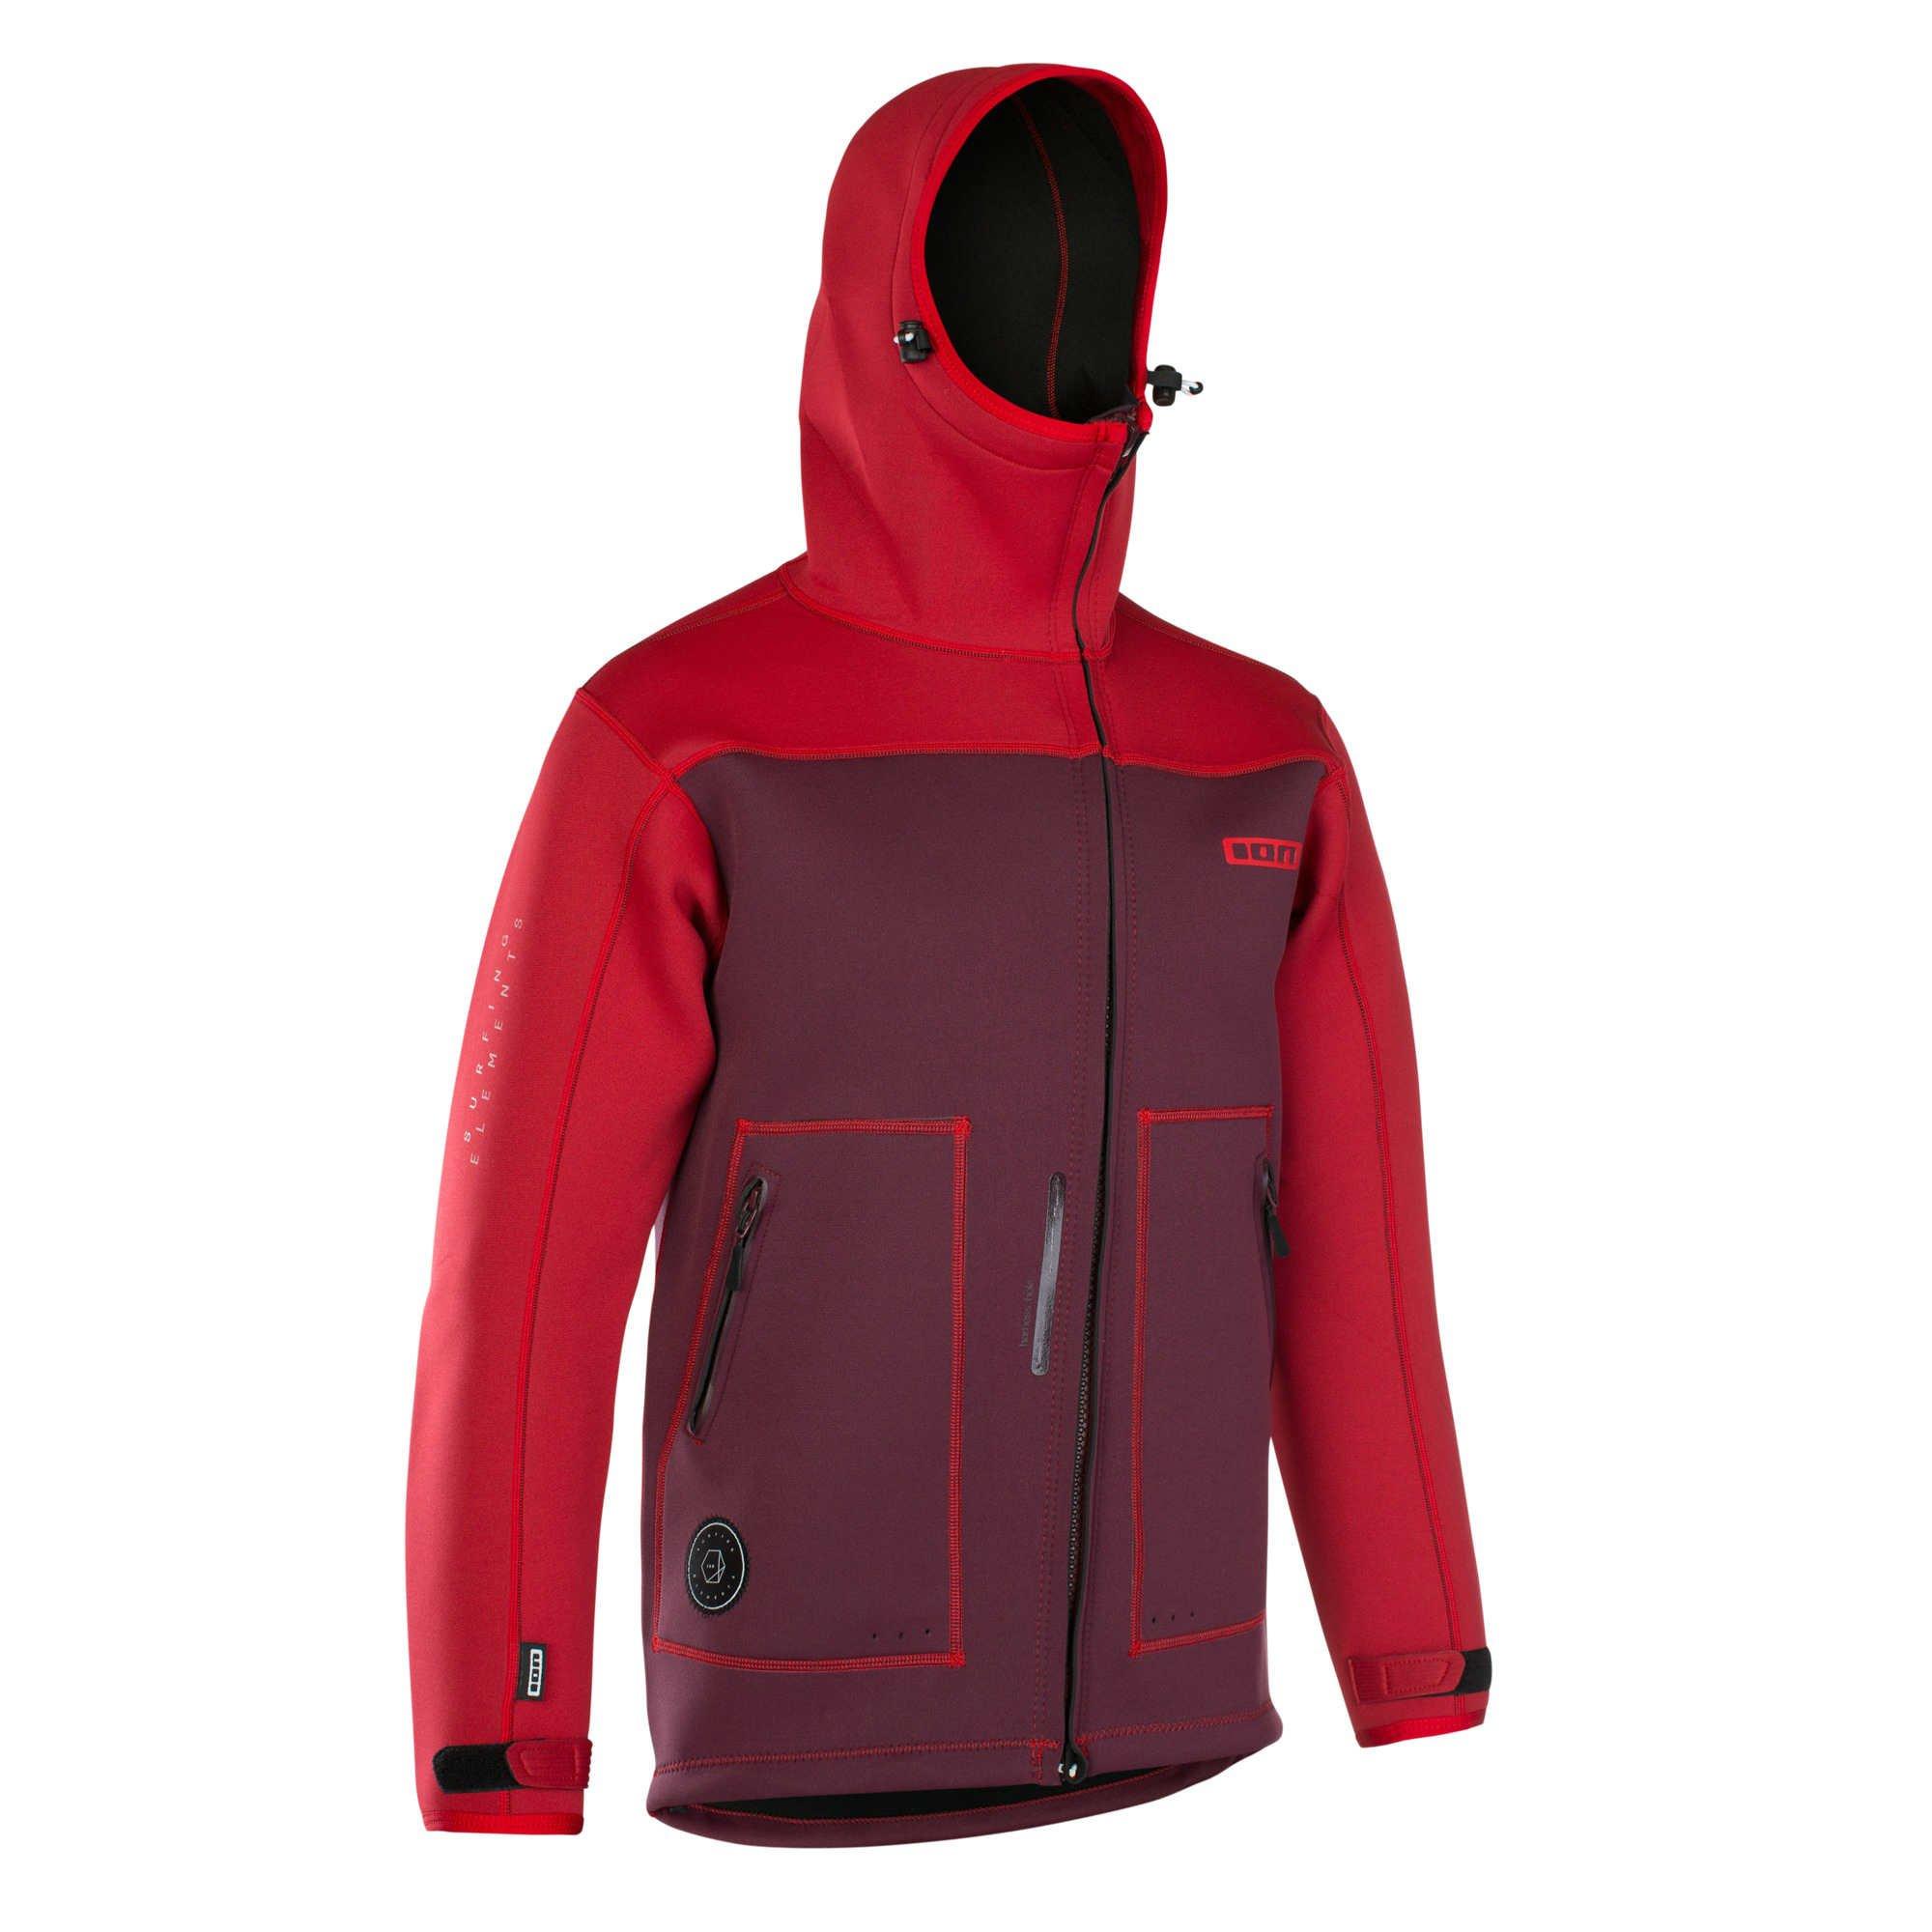 ION Neo Shelter Jacket Amp 2019 • Duotone Pro Shop Roma 1e906f292bbb